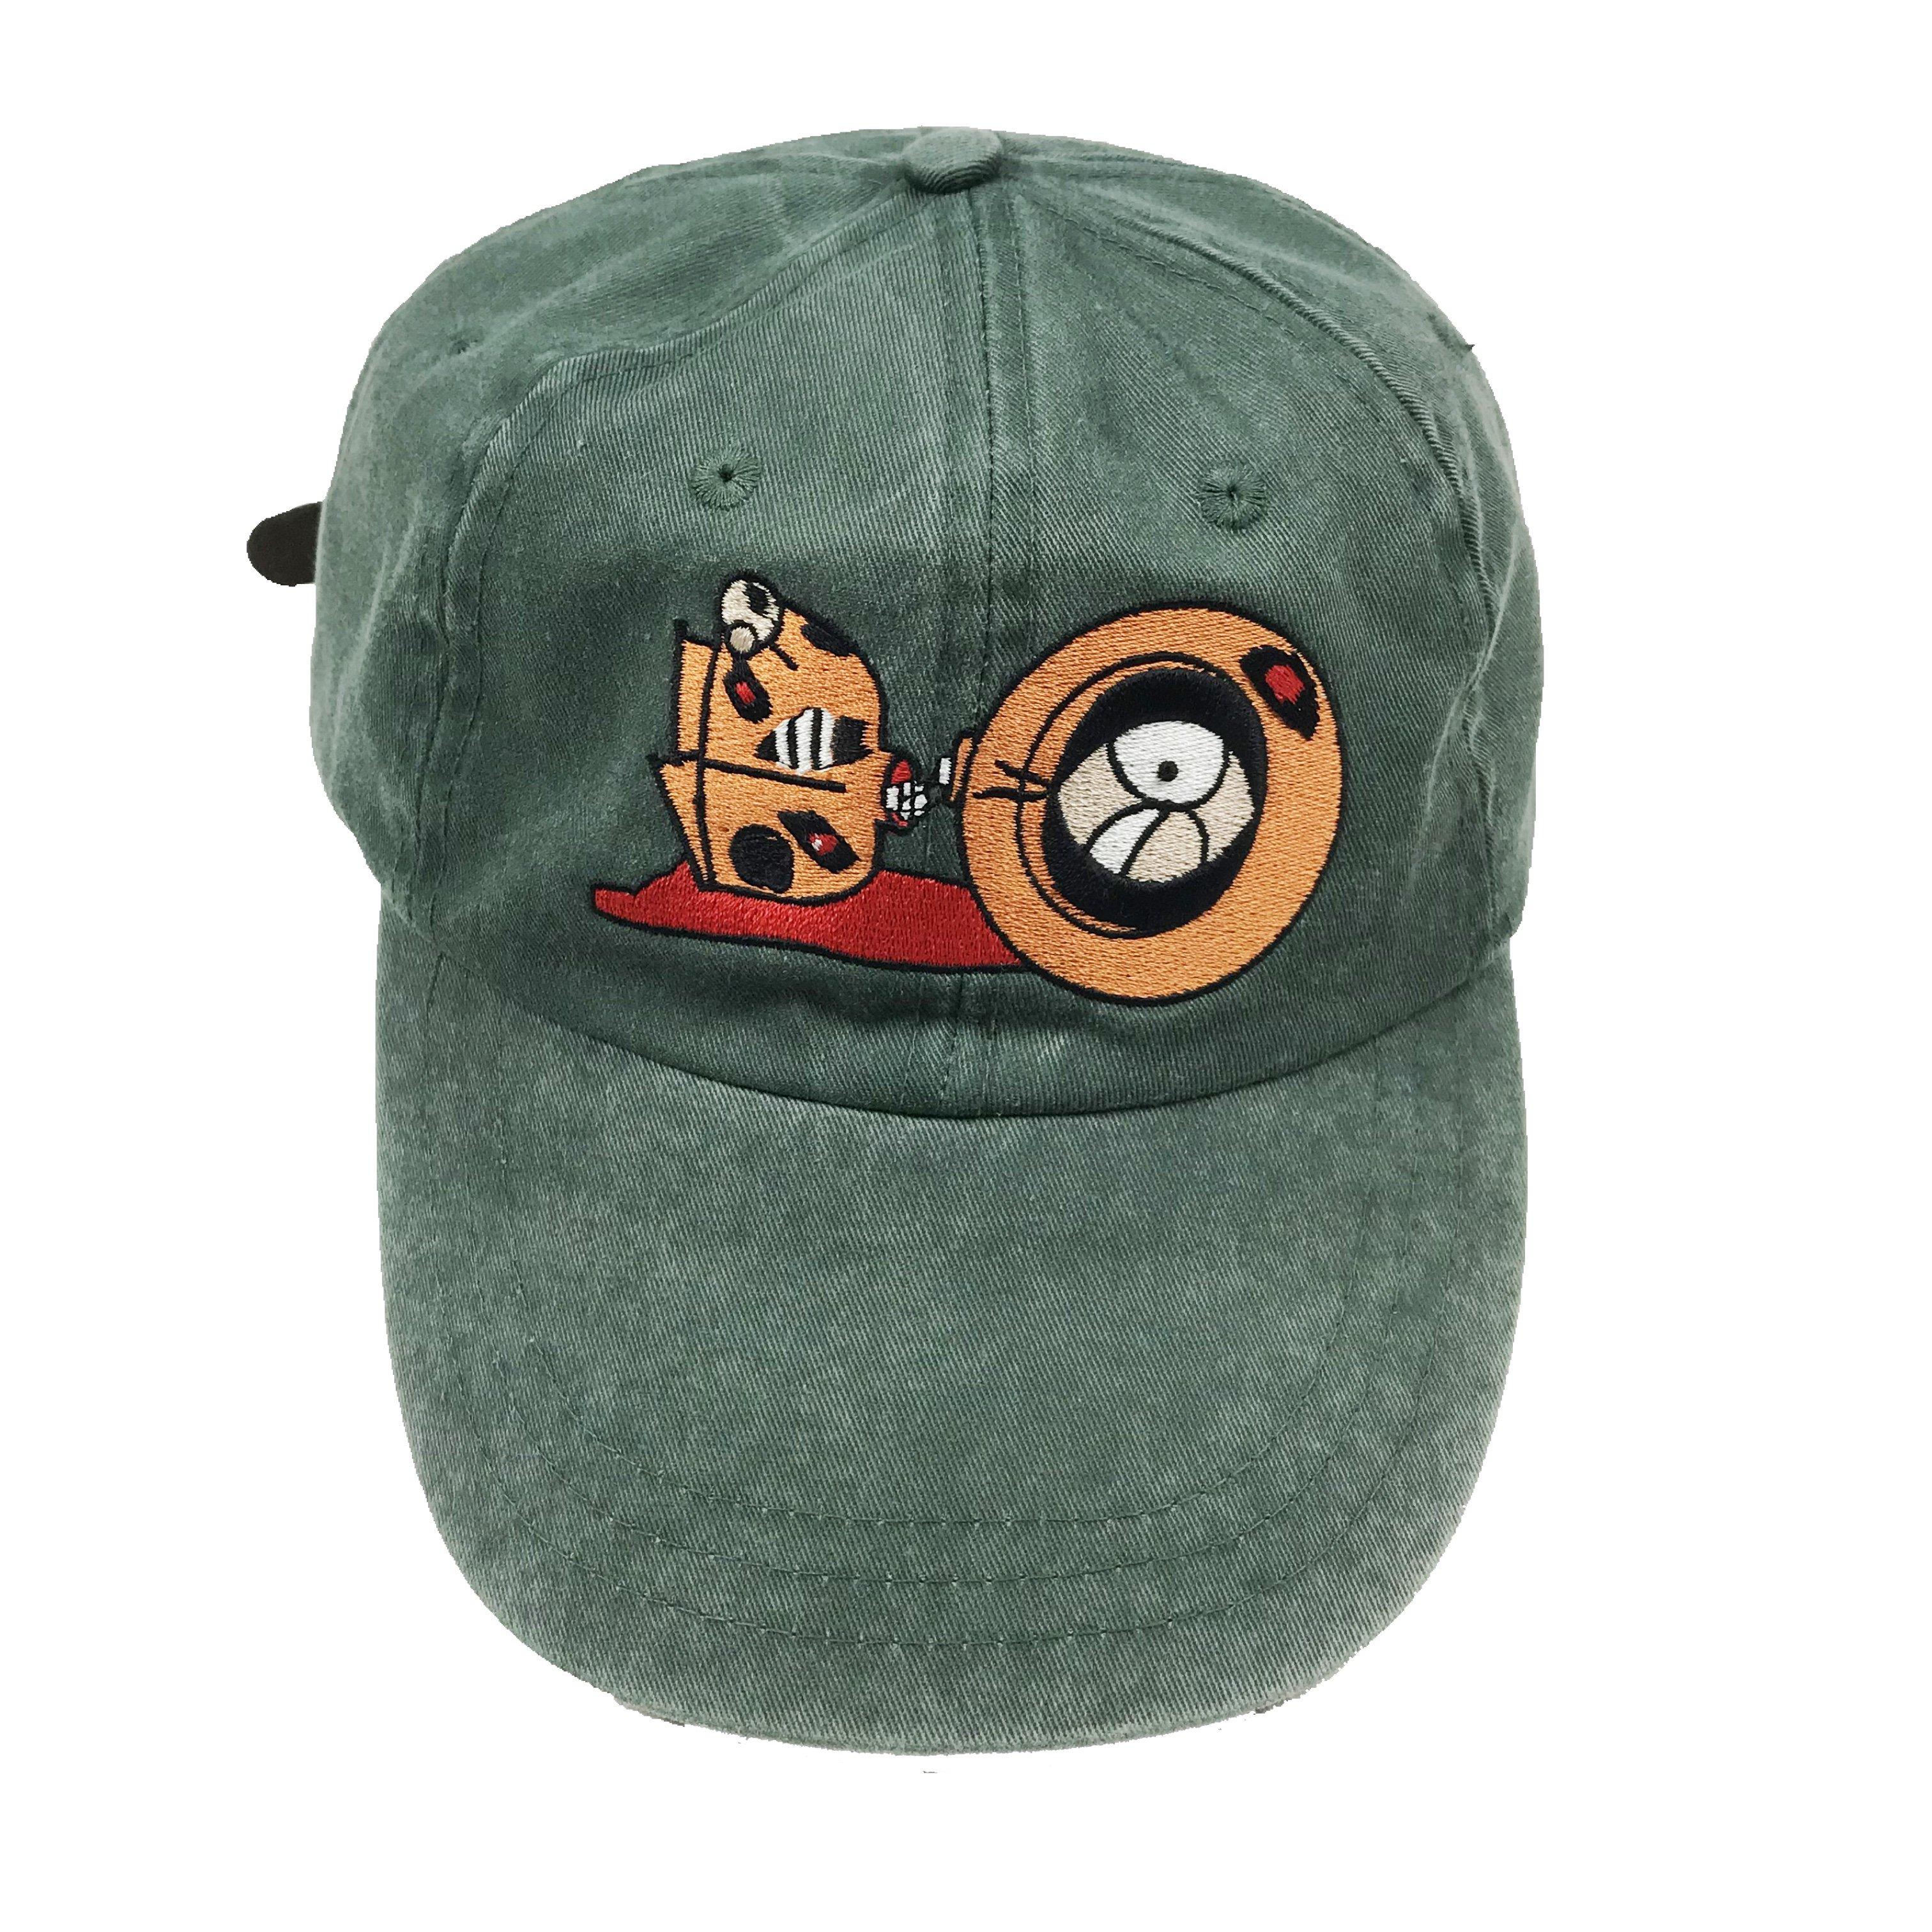 Vintage 1997 South Park dad hat. Amazing... - Depop